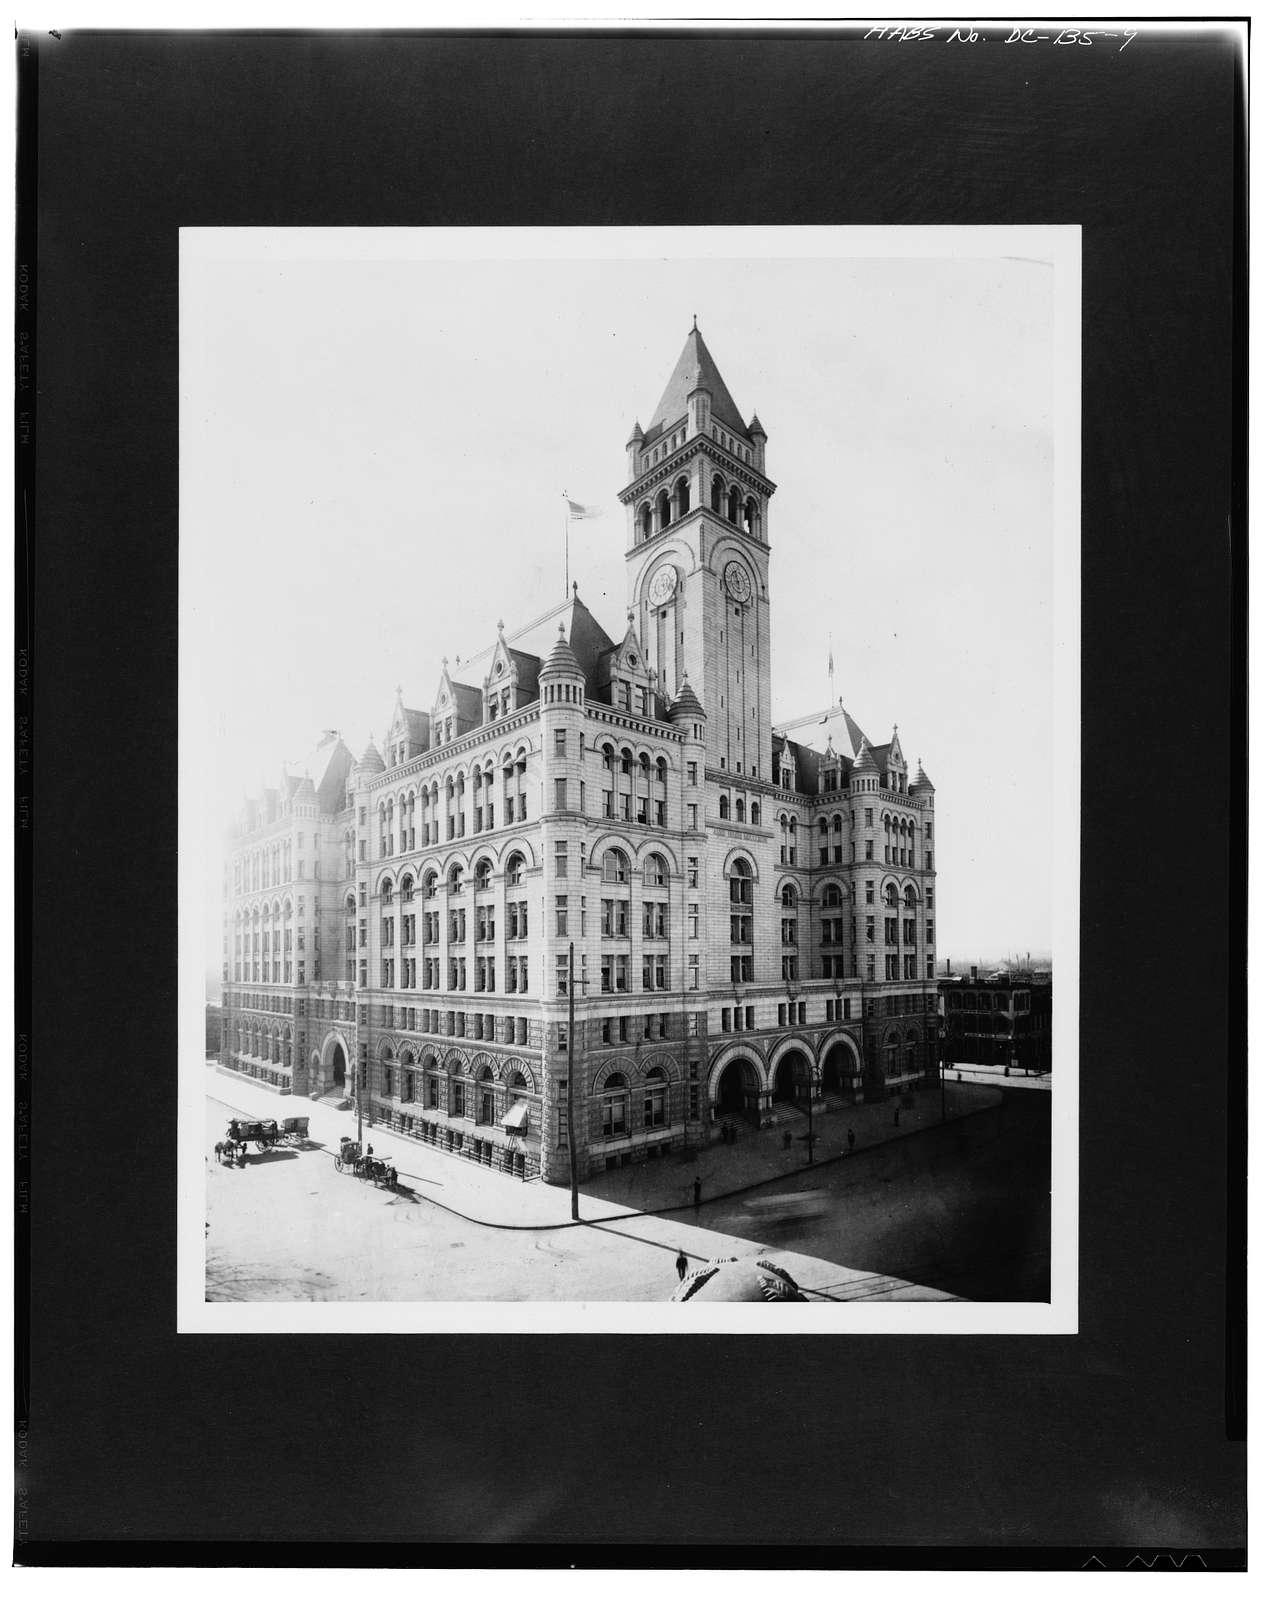 U.S. Post Office Department, 1100 Pennsylvania Avenue Northwest, Washington, District of Columbia, DC